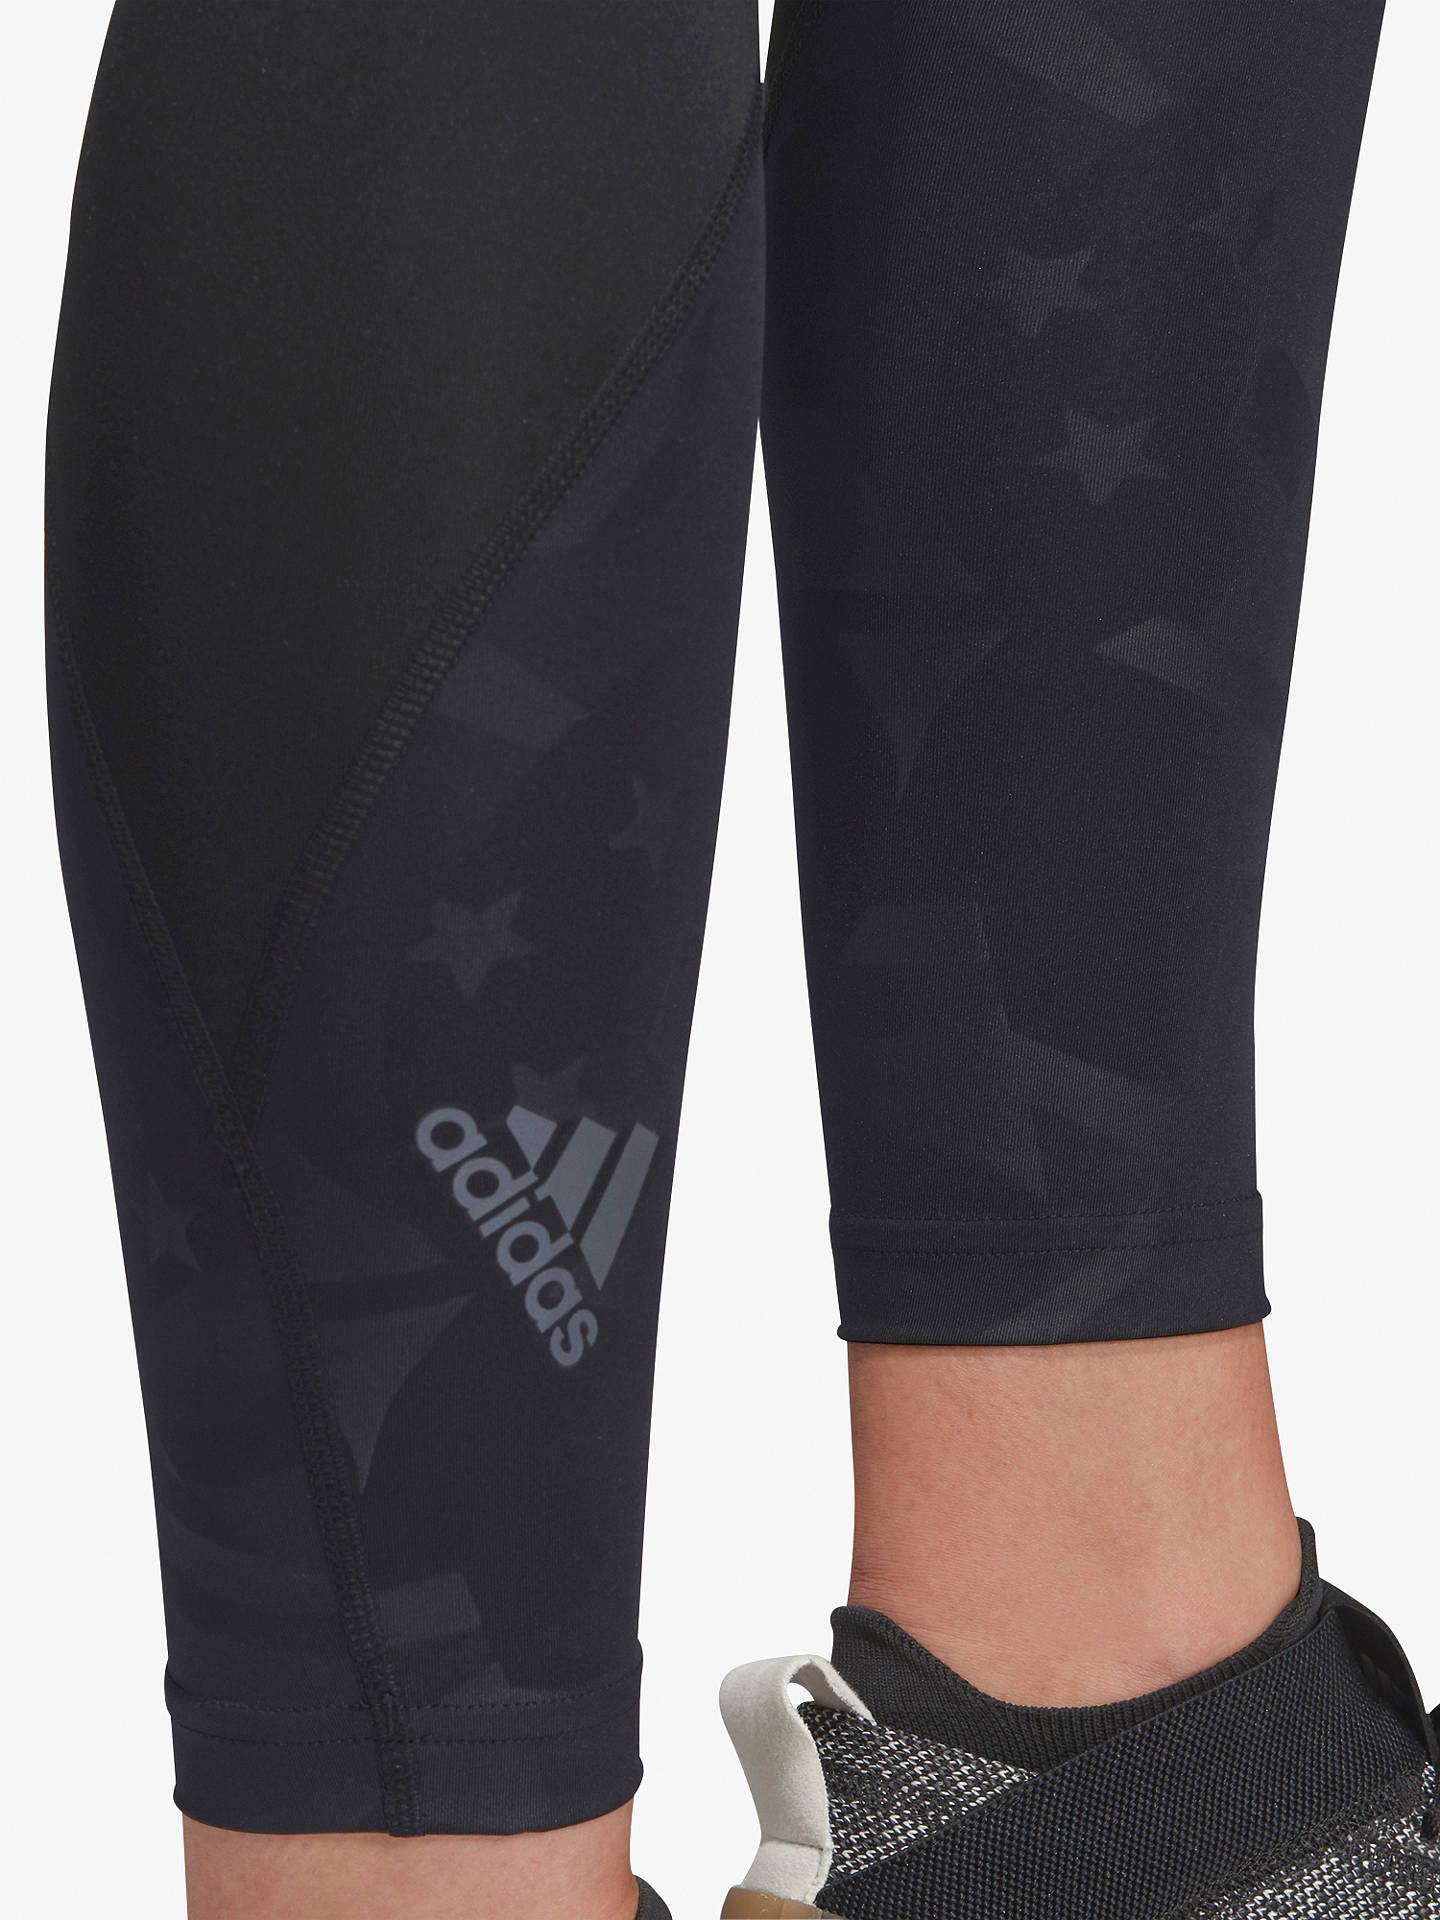 fc00636469 ... Buy adidas Alphaskin Sport 2.0 Embossed 7/8 Training Tights, Black,  Black,